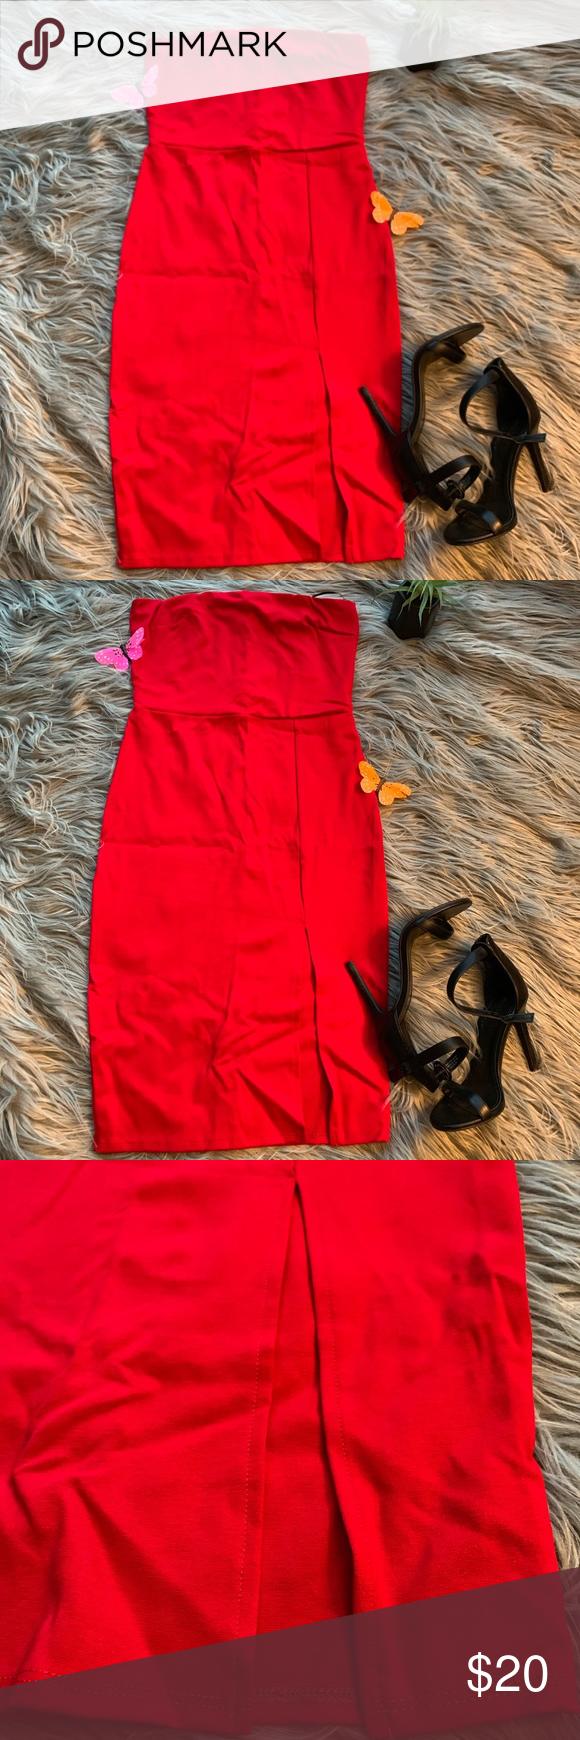 891c9bcf786 Fashion Nova Brady Tube dress M Fashion Nova Brady red strapless dress size  medium. Strapless